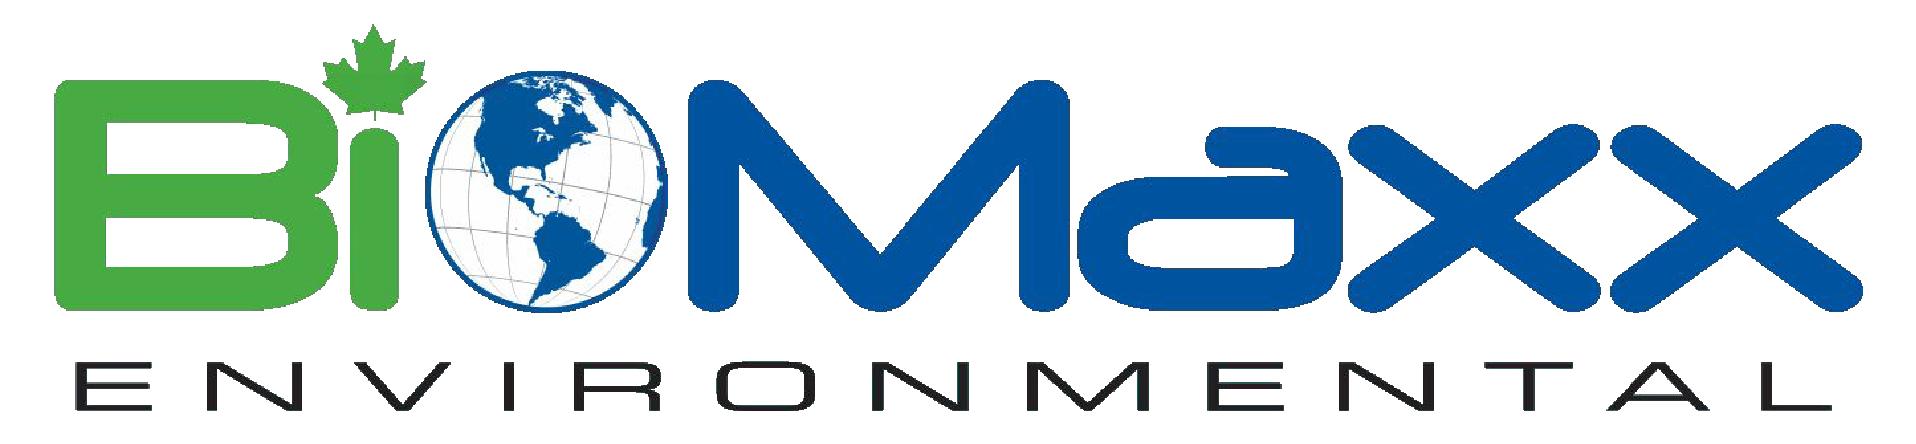 Biomaxx Environmental